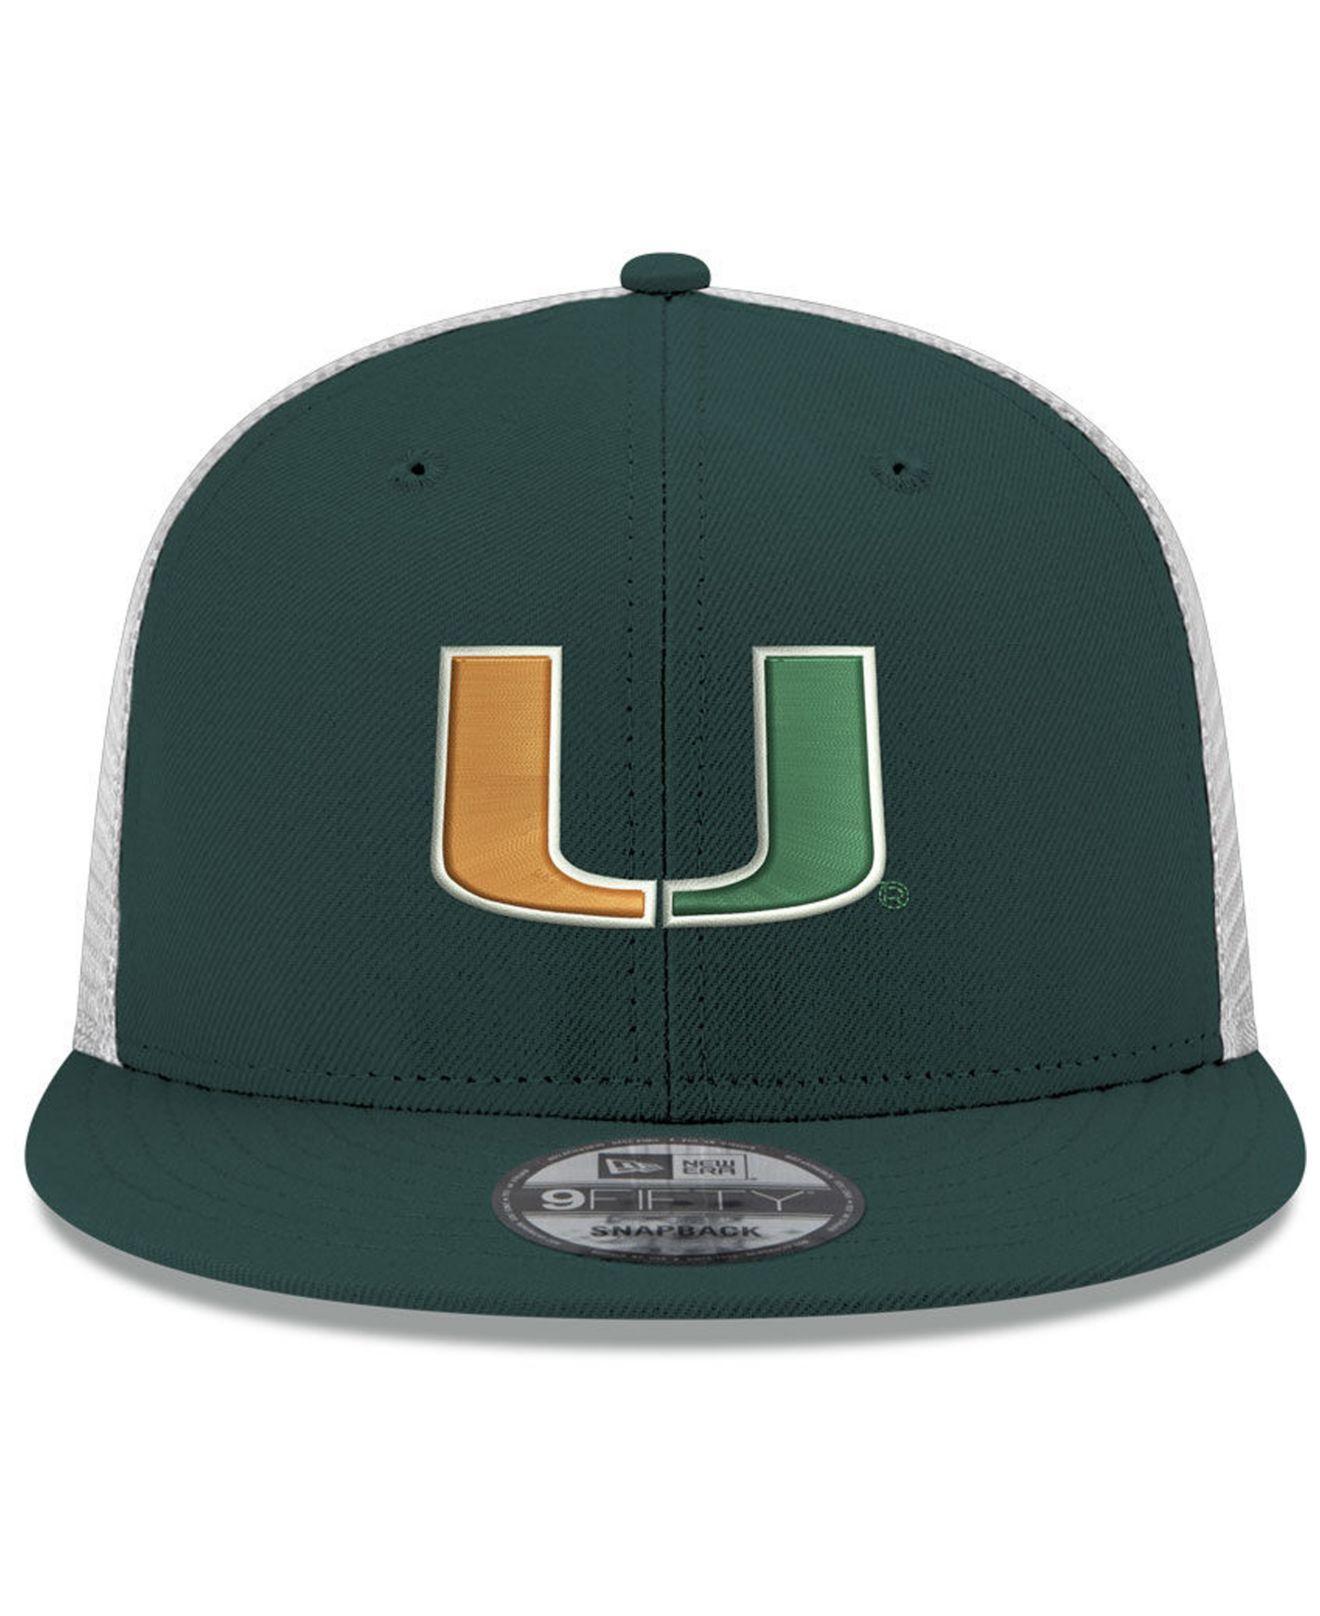 12874fb2c10 Lyst - KTZ Miami Hurricanes Tc Meshback Snapback Cap in Green for Men